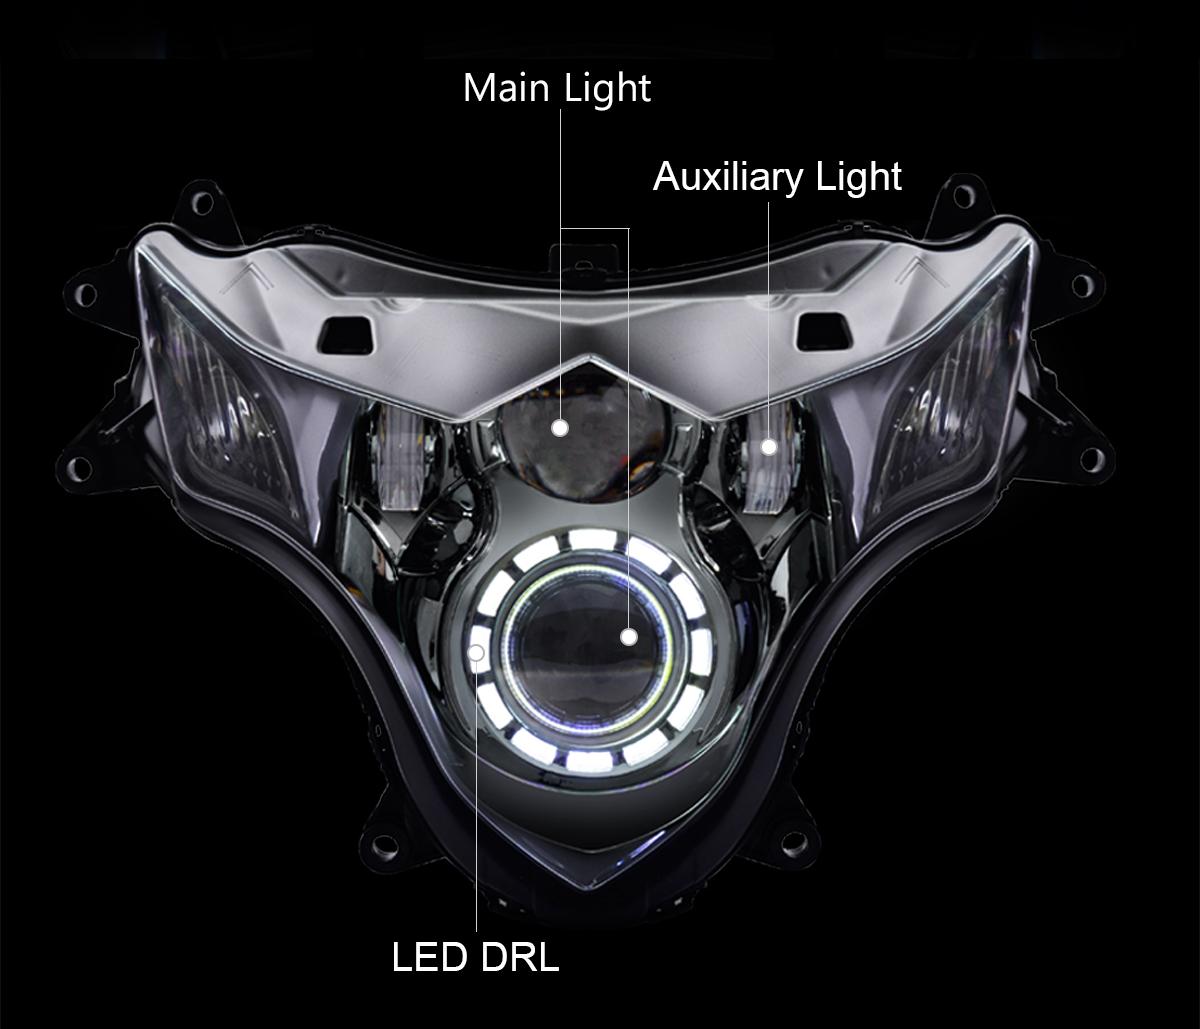 Suzuki GSXR1000 LED Headlight 2009-2016